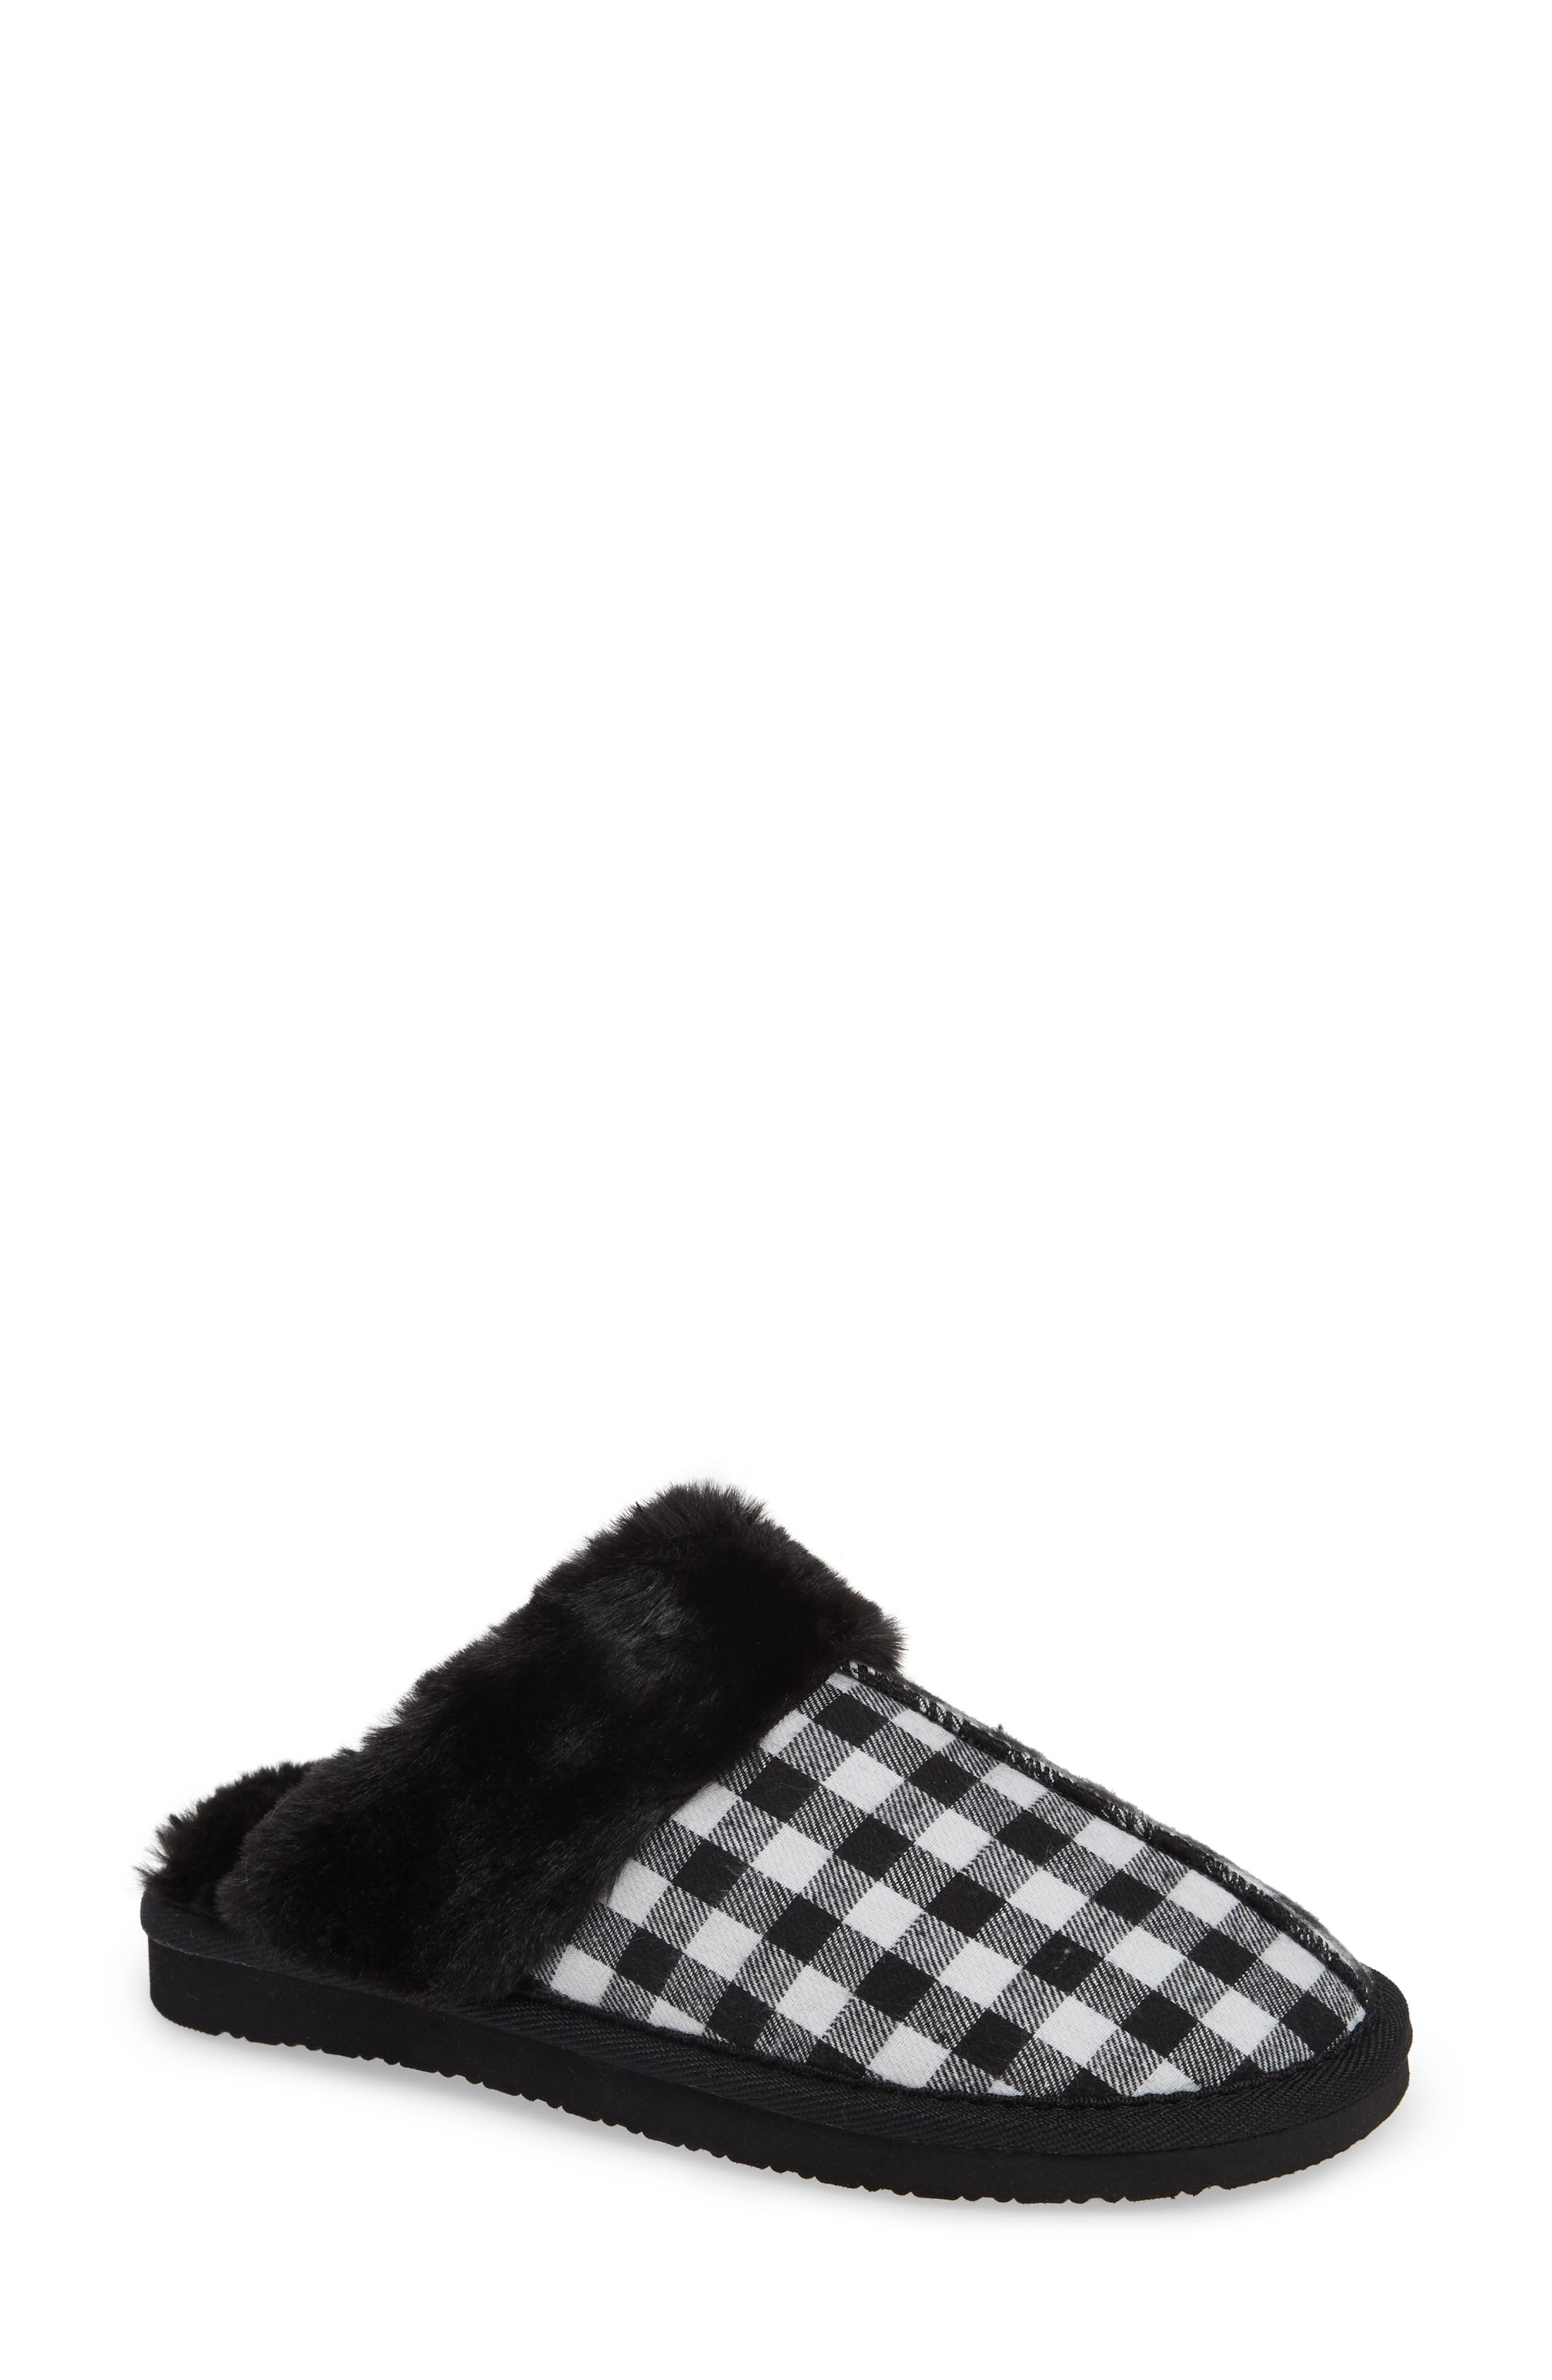 MINNETONKA Mule Slipper, Main, color, BLACK/ WHITE PLAID FABRIC